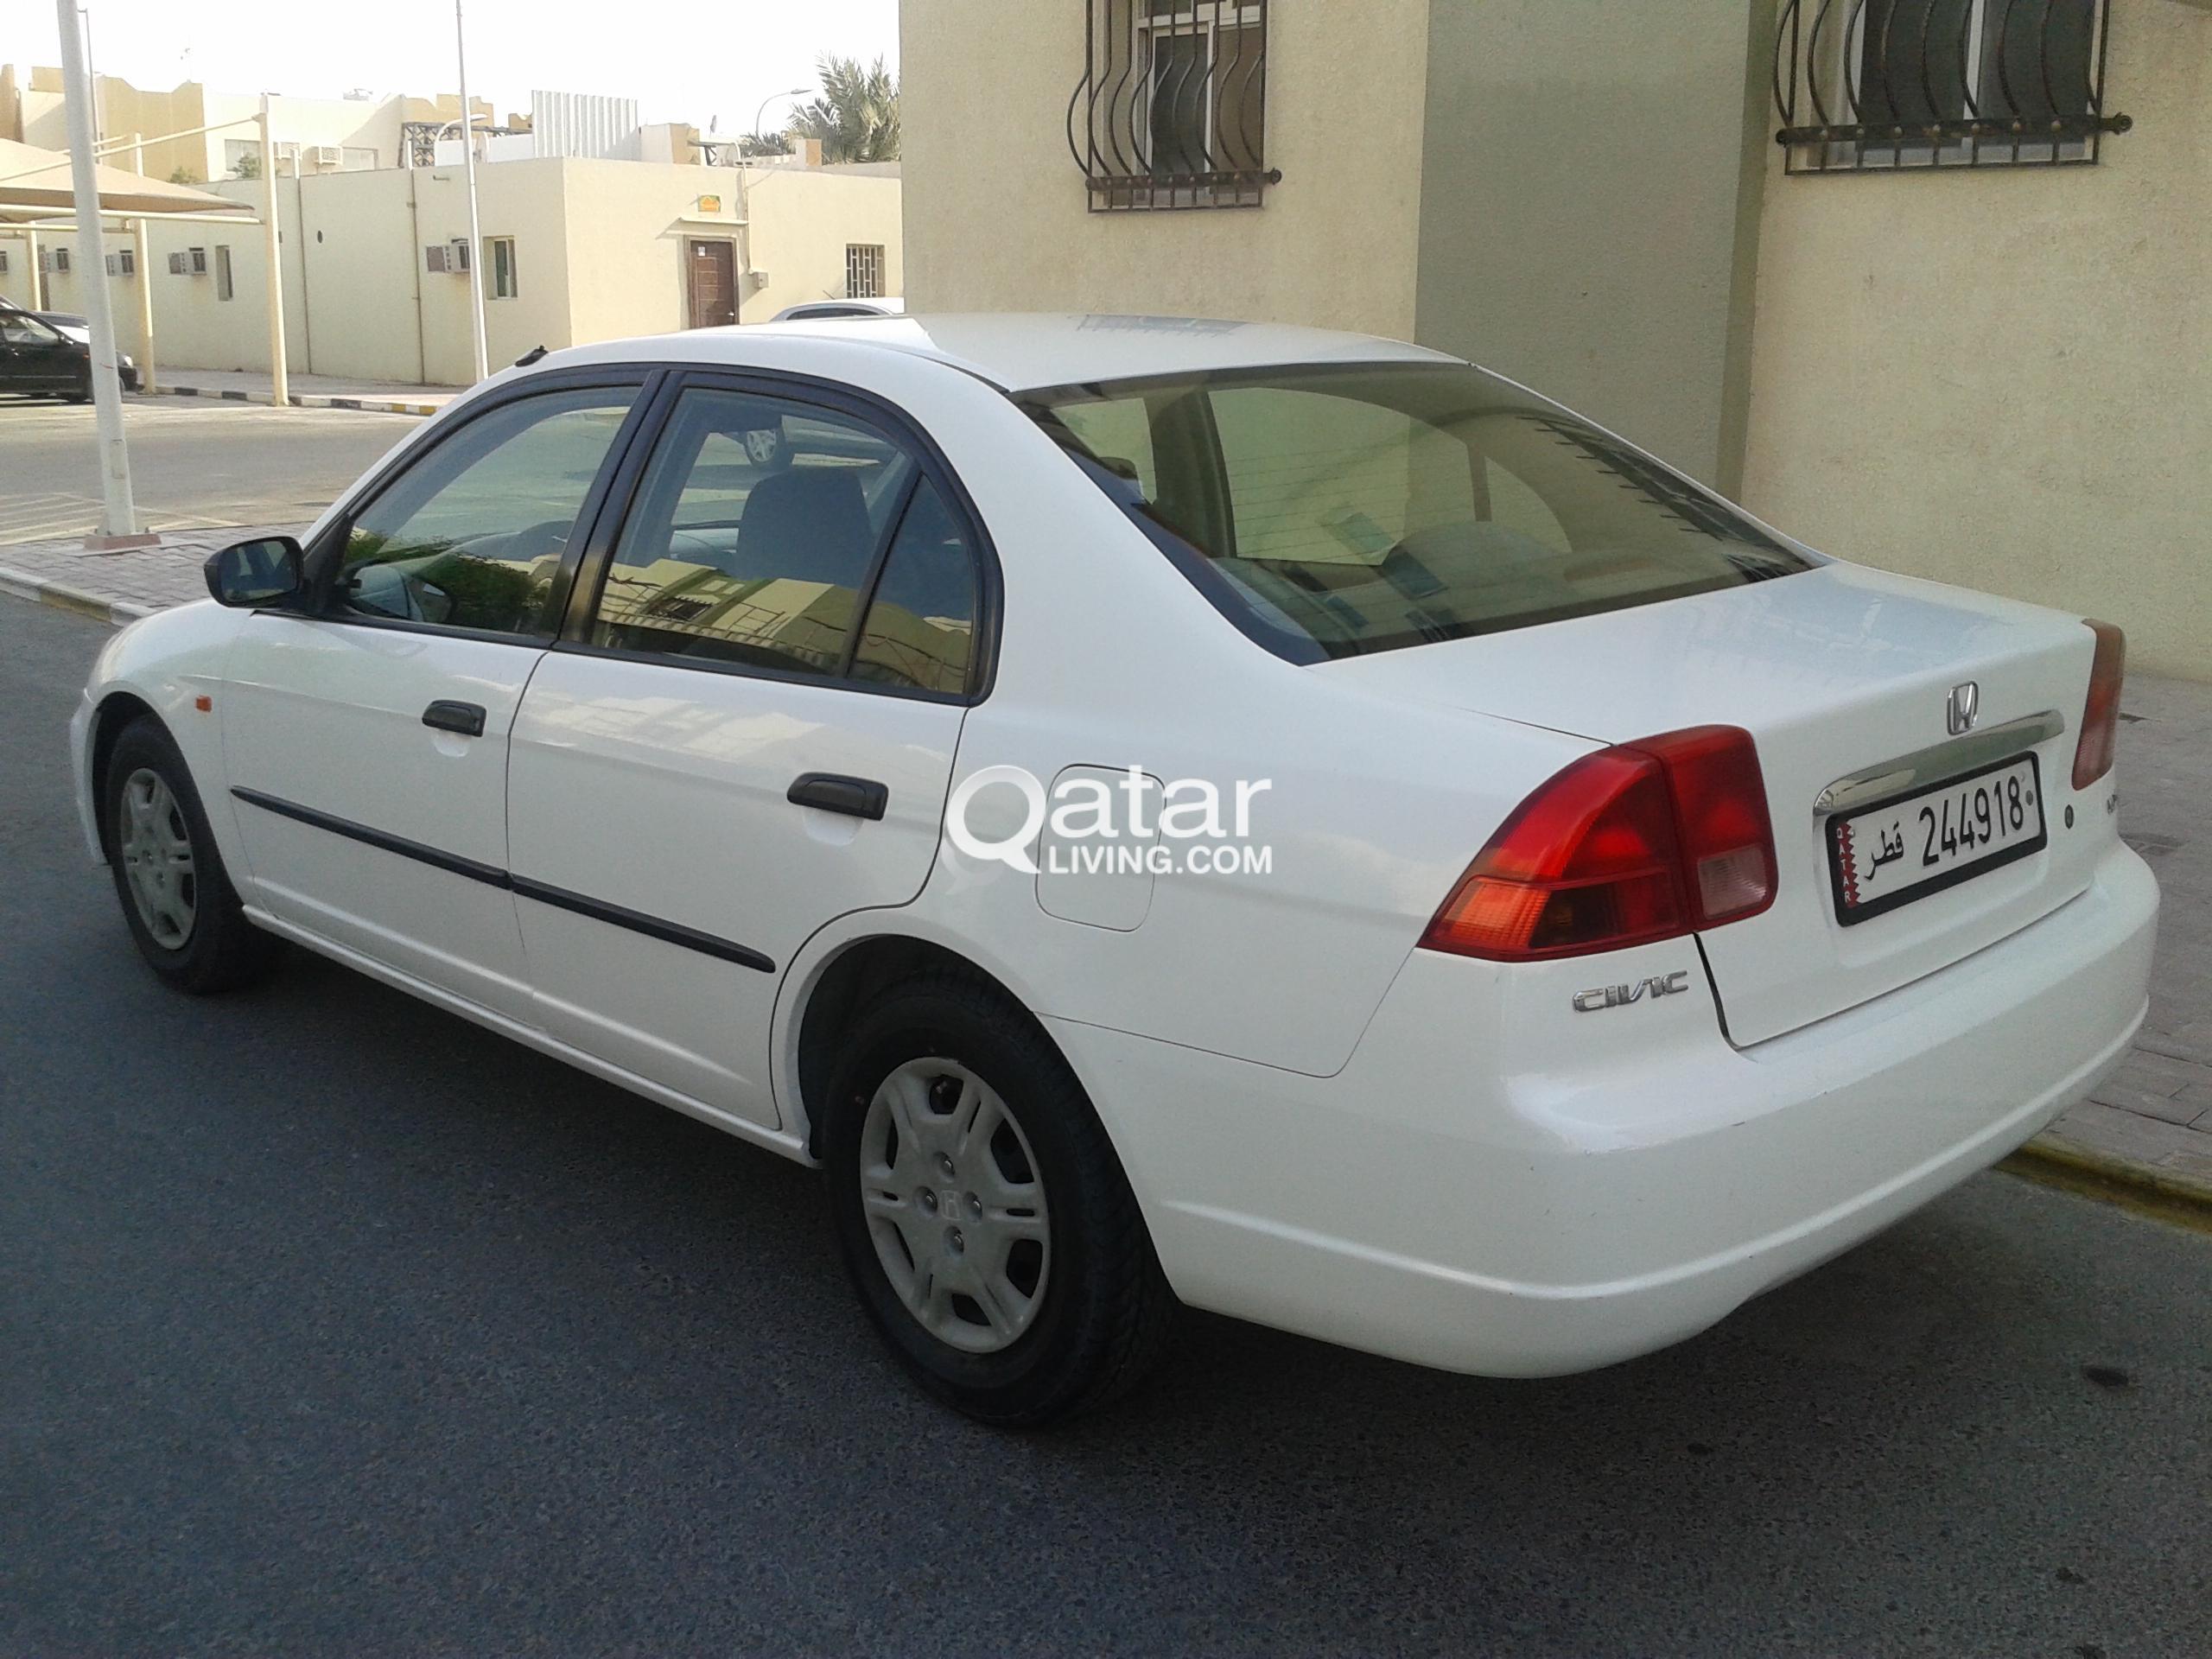 Kekurangan Honda Civic 2002 Murah Berkualitas